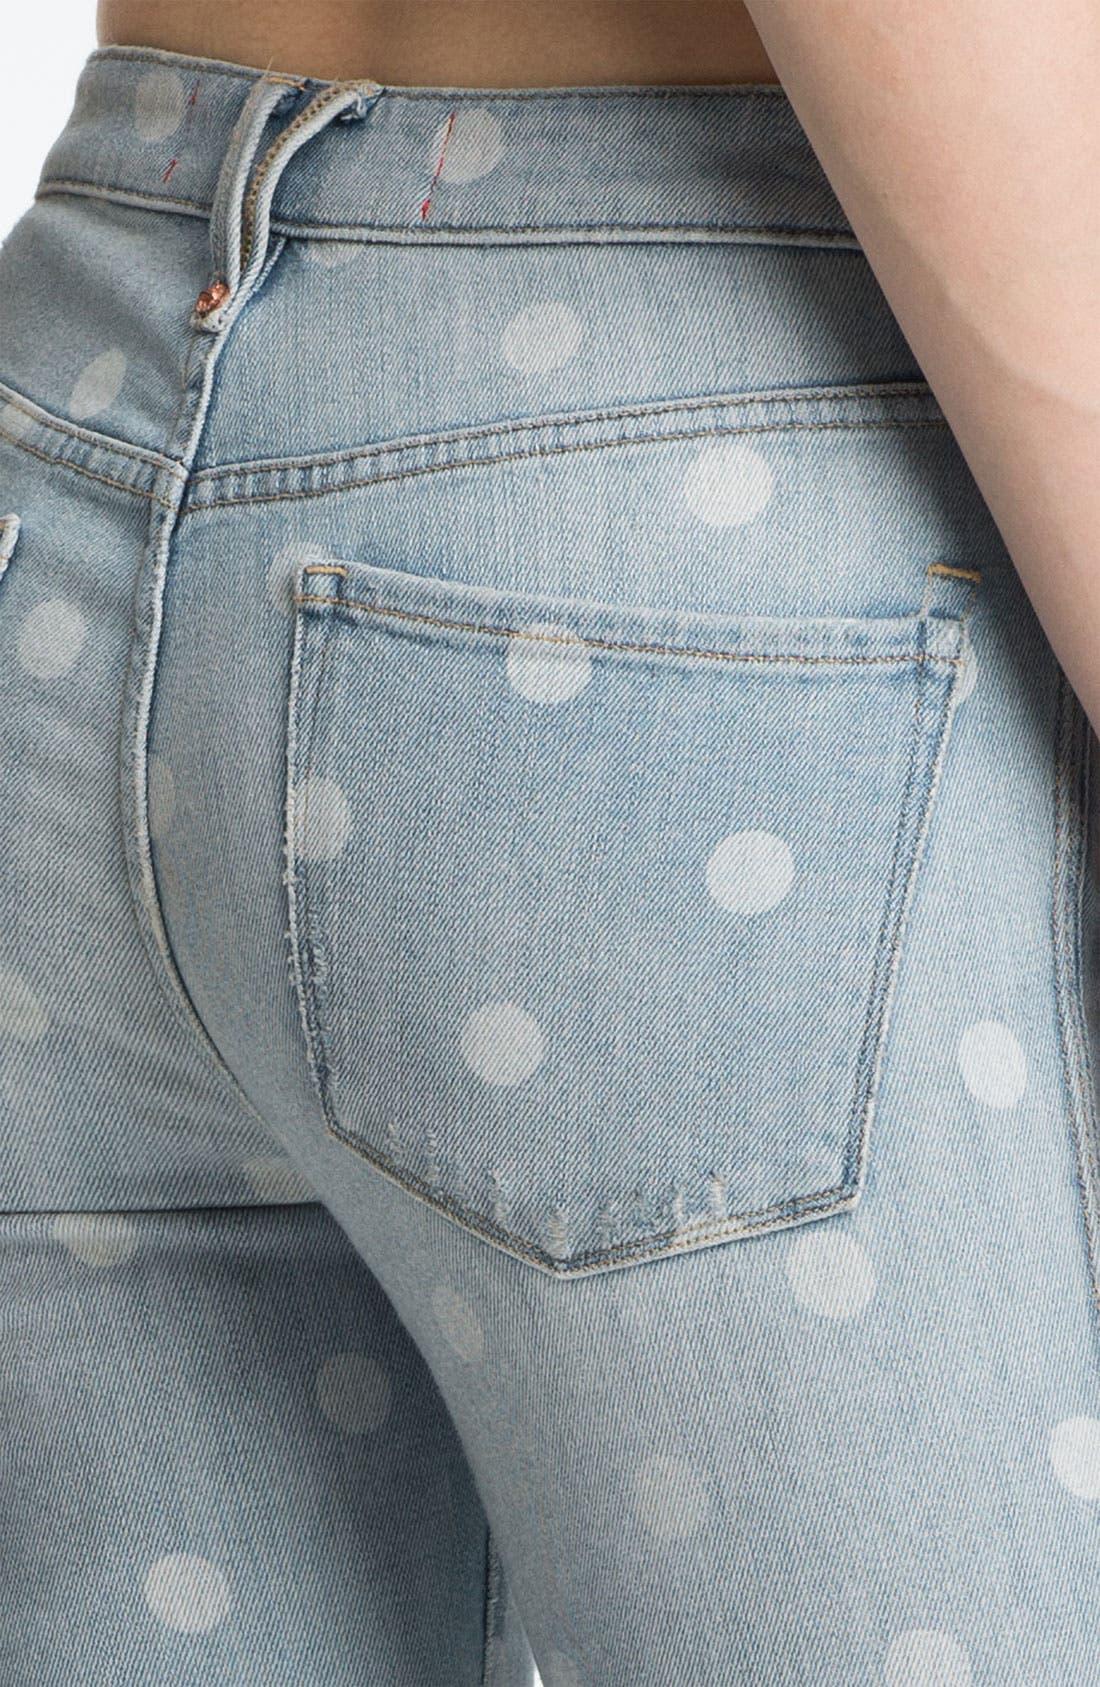 Distressed Print Skinny Jeans,                             Alternate thumbnail 2, color,                             400